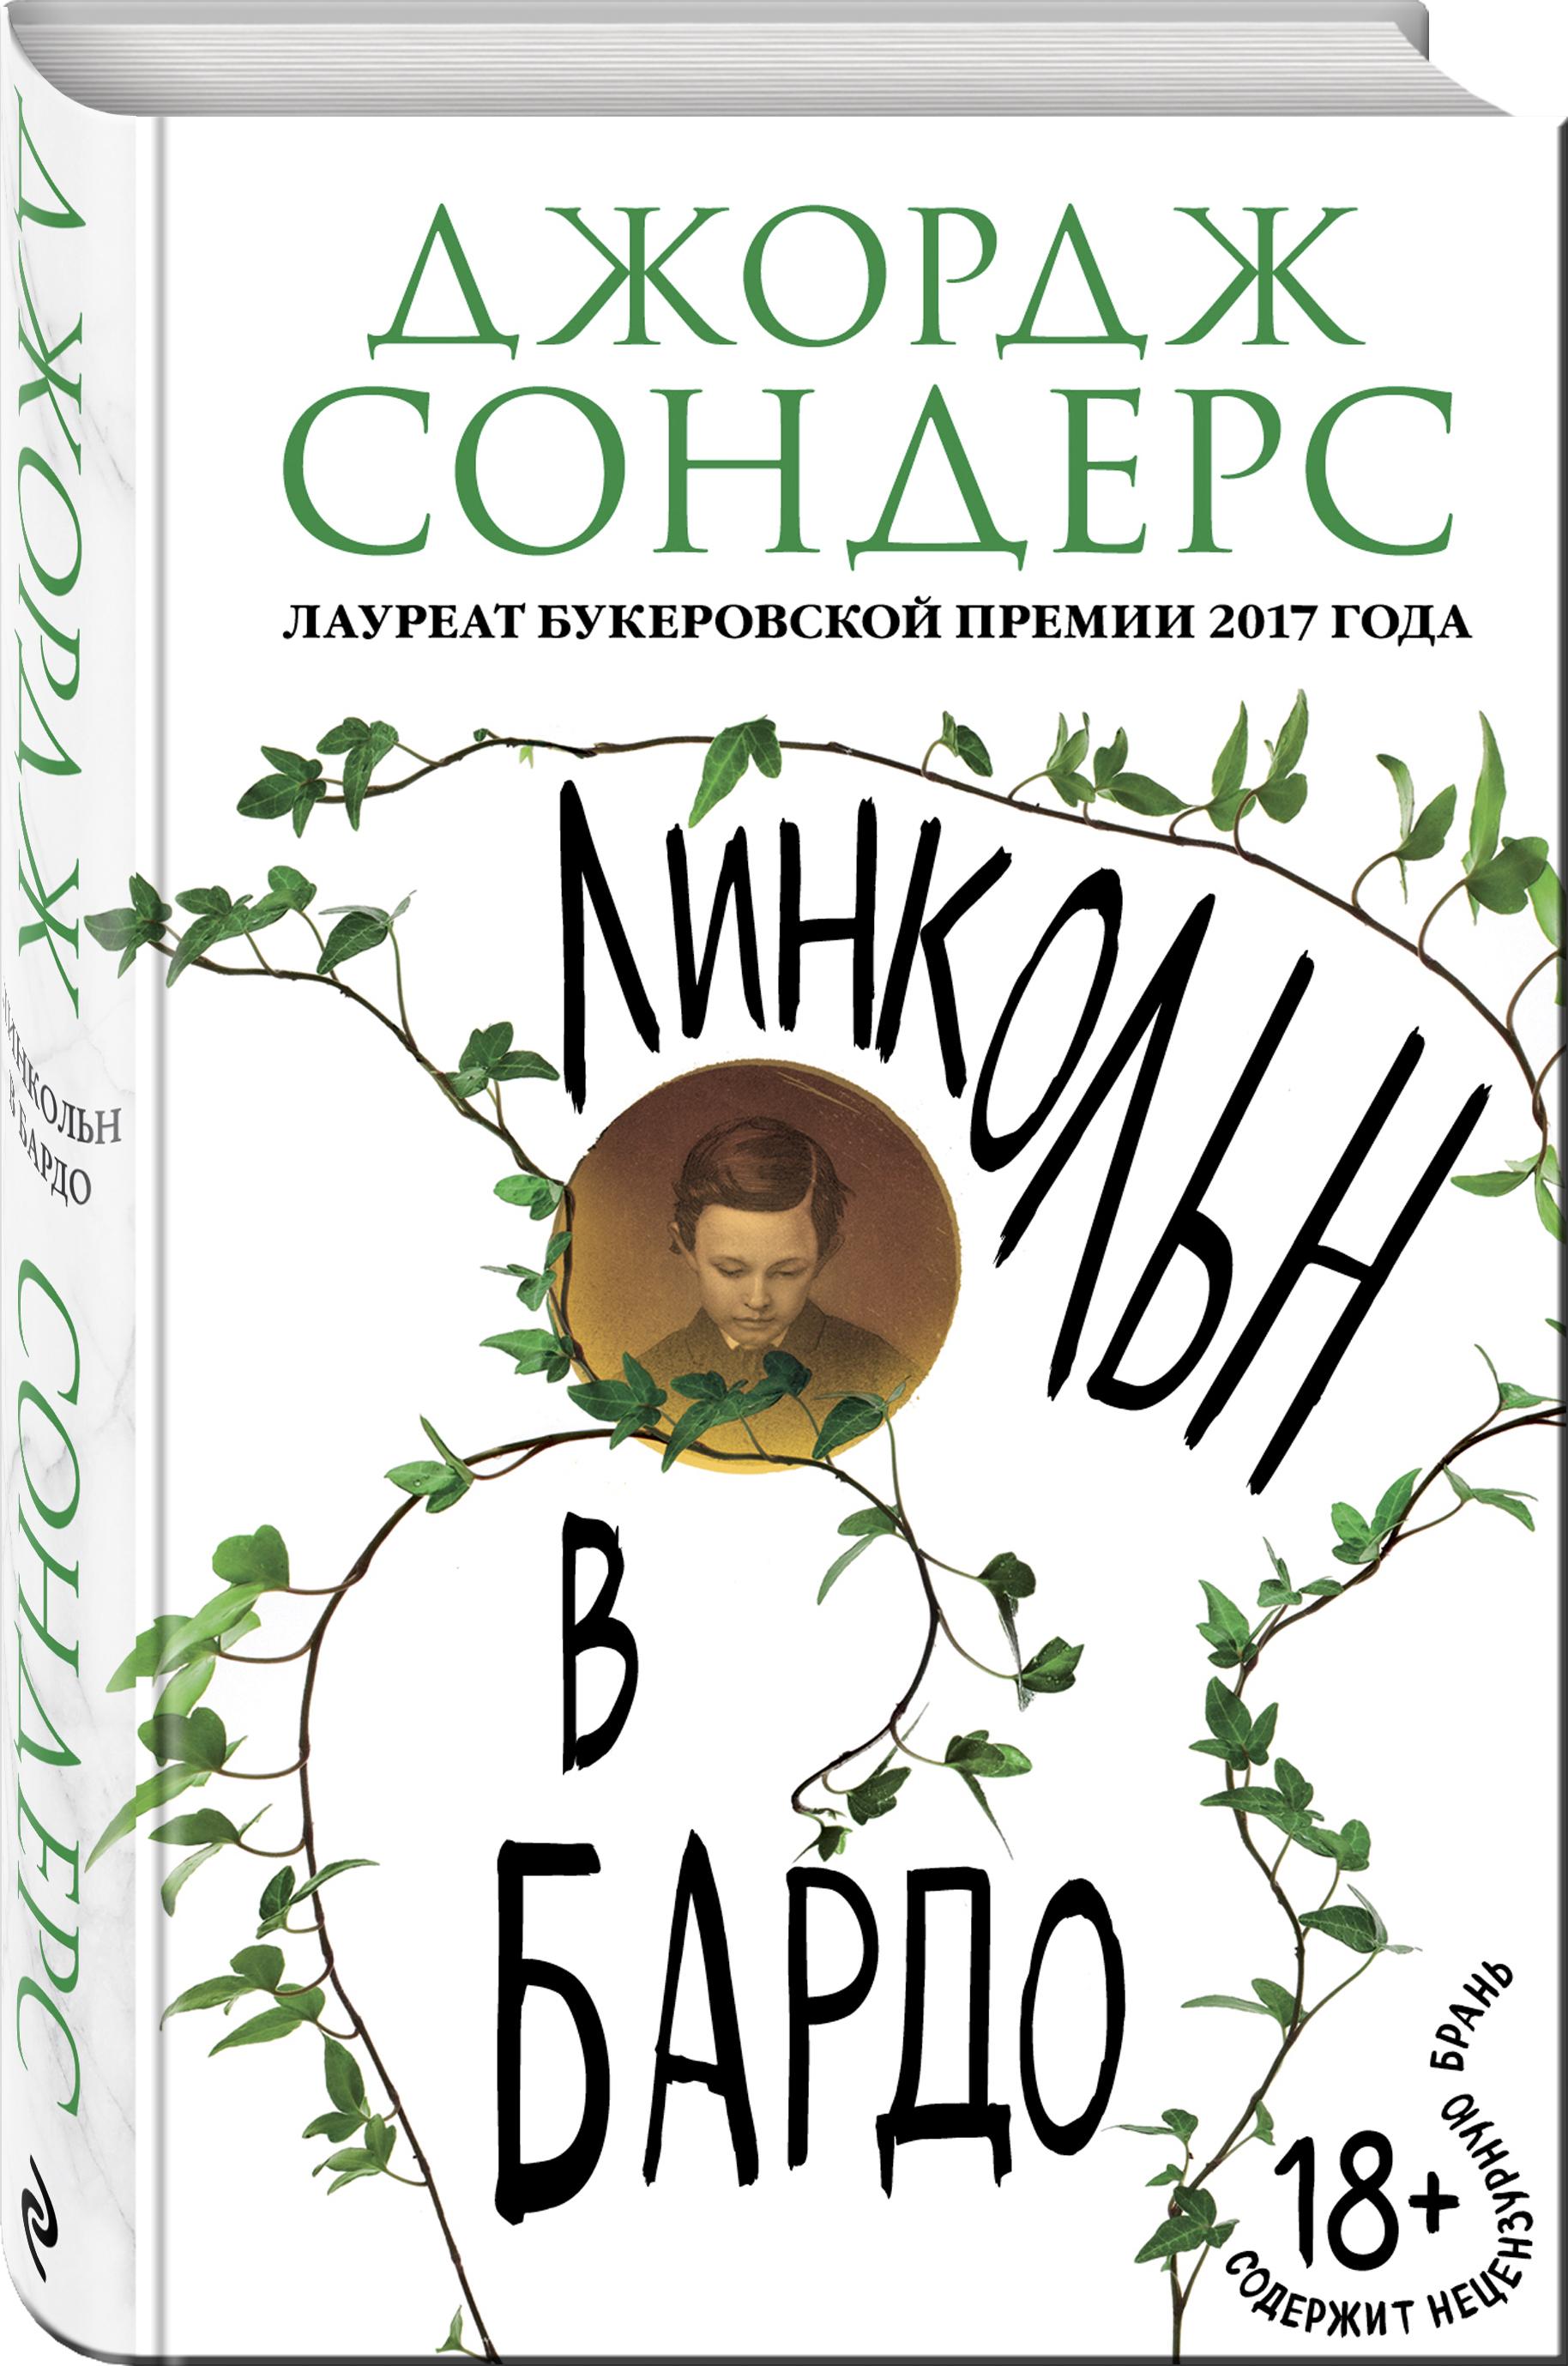 Джордж Сондерс Линкольн в бардо цены